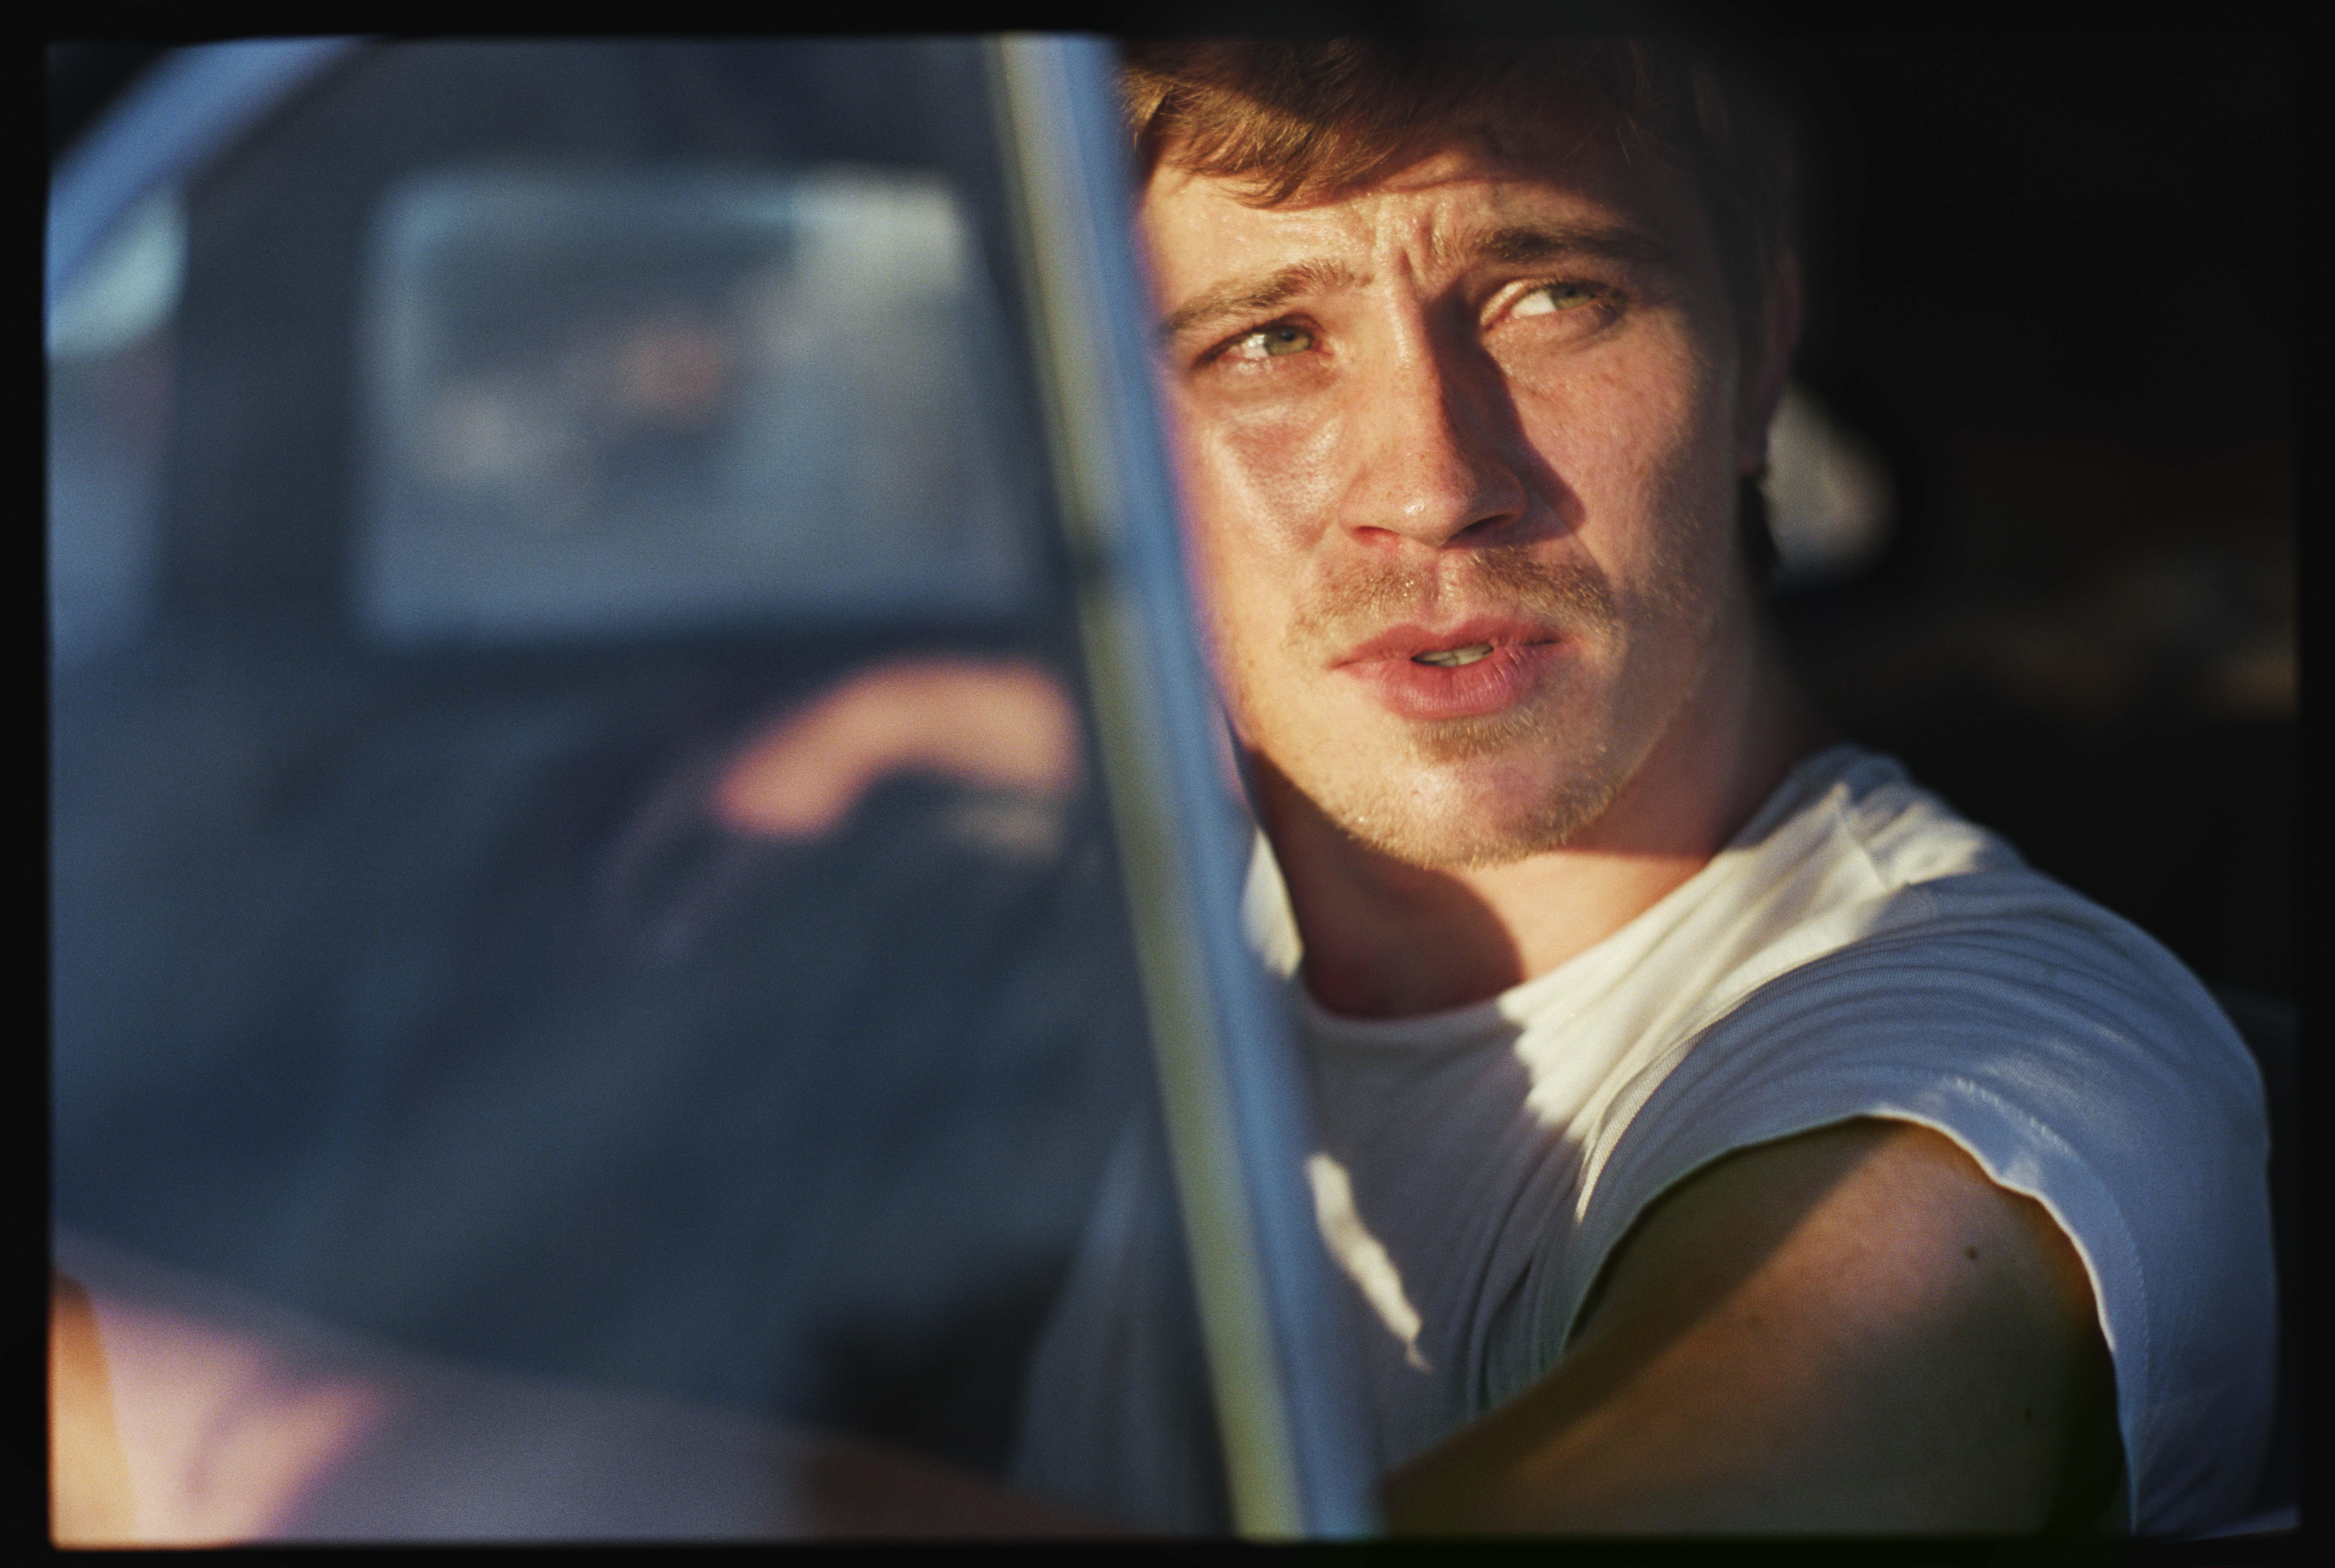 кадры из фильма На дороге Гарретт Хедланд,